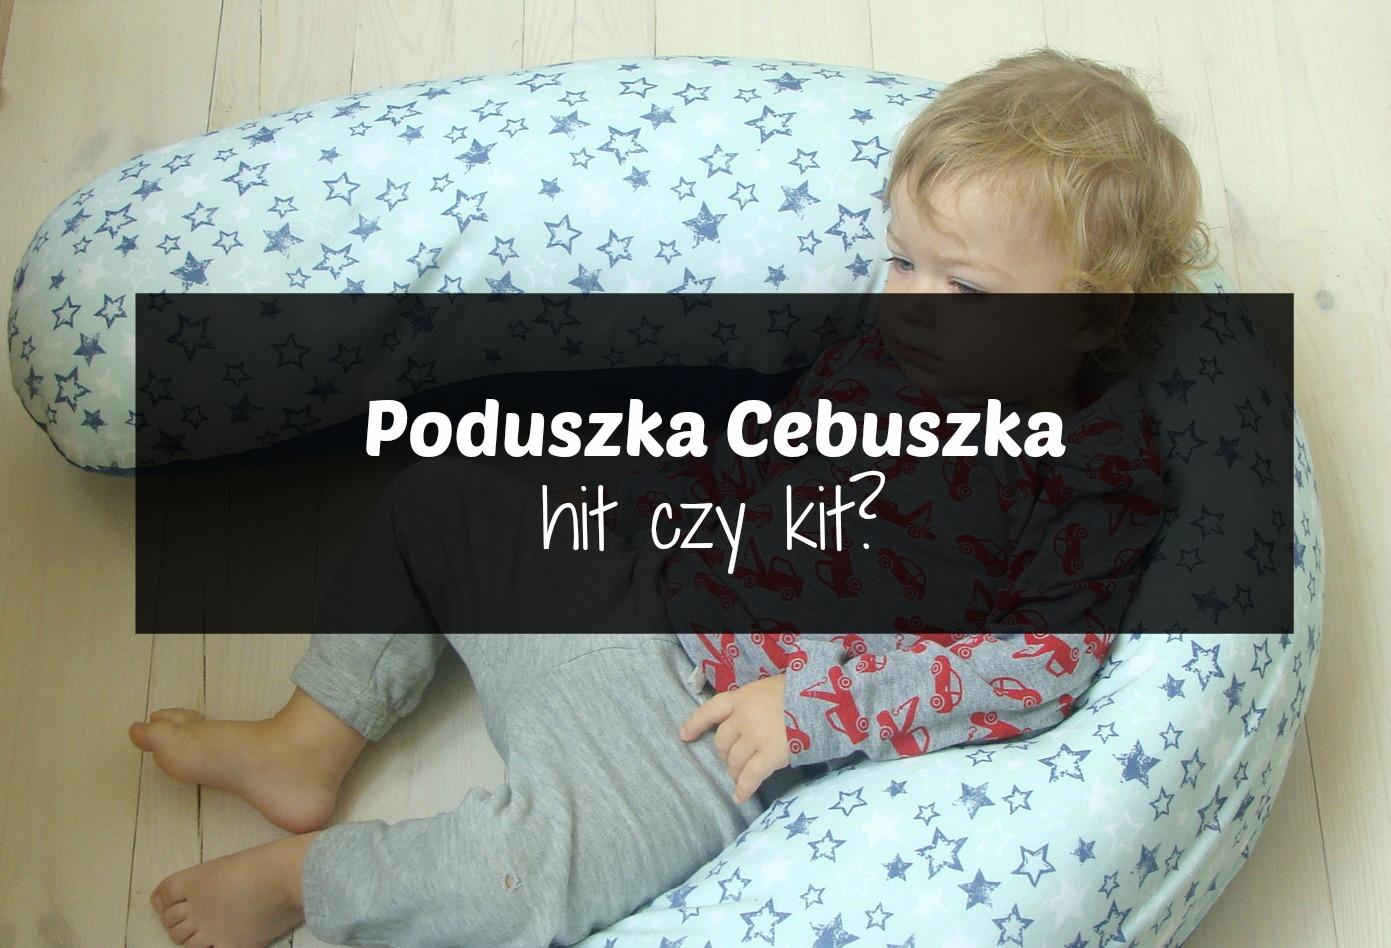 Poduszka Cebuszka